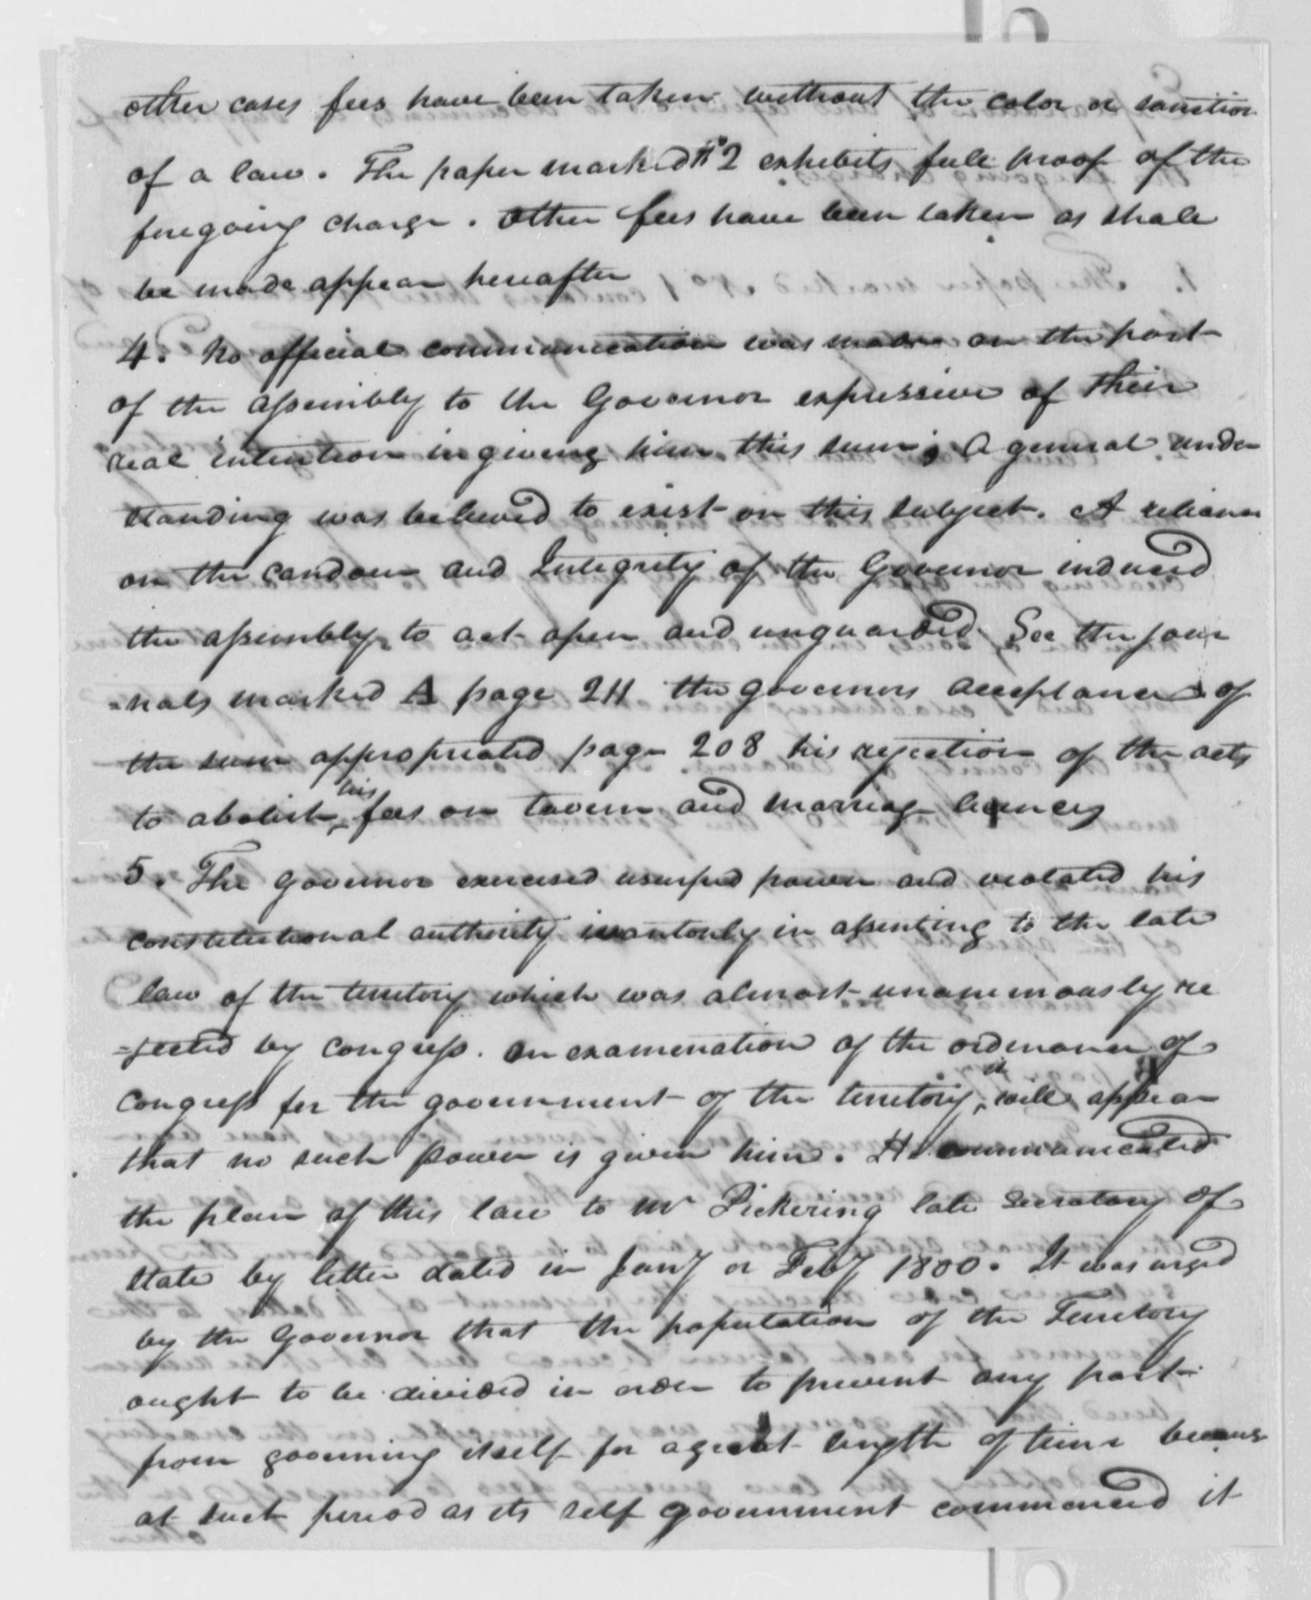 Thomas Worthington Arthur St. Clair, February 20, 1802, Charges and Explanation